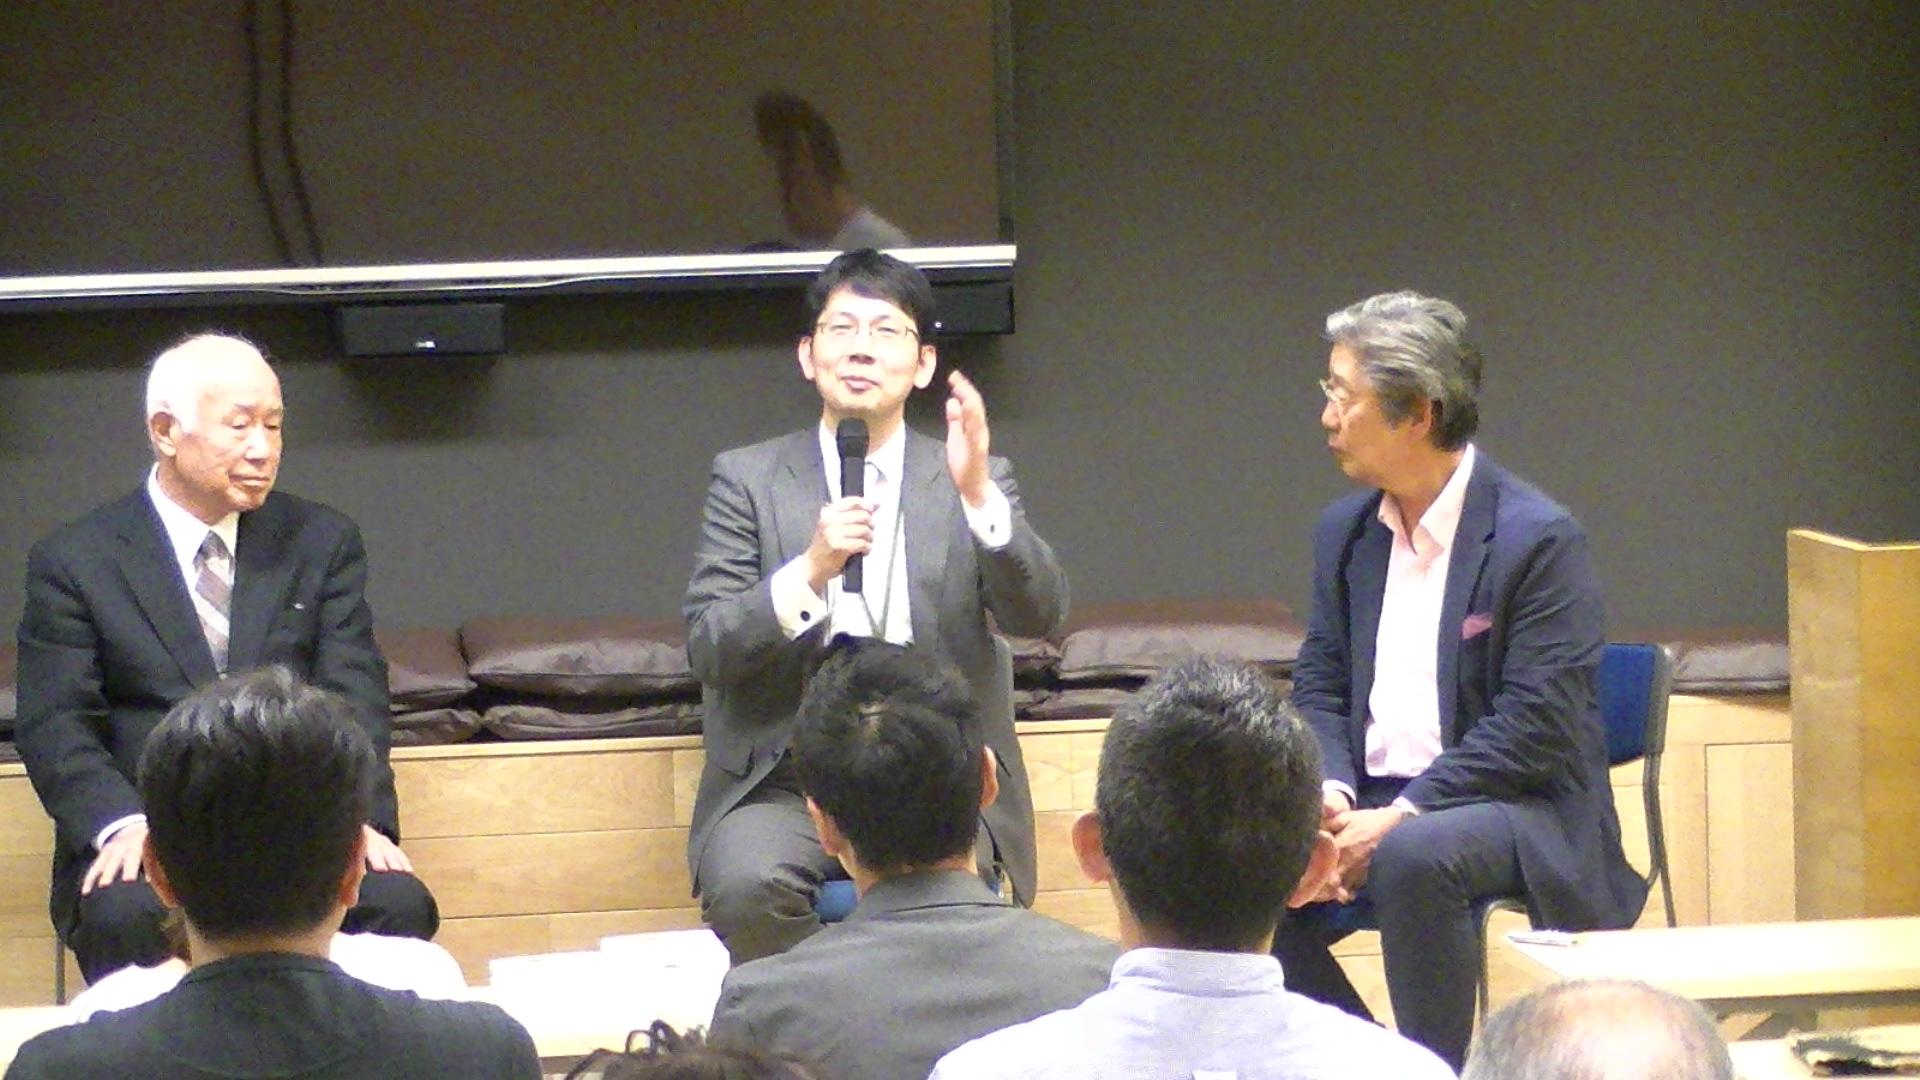 PIC 0041 - 4月1日東京思風塾の開催になります。